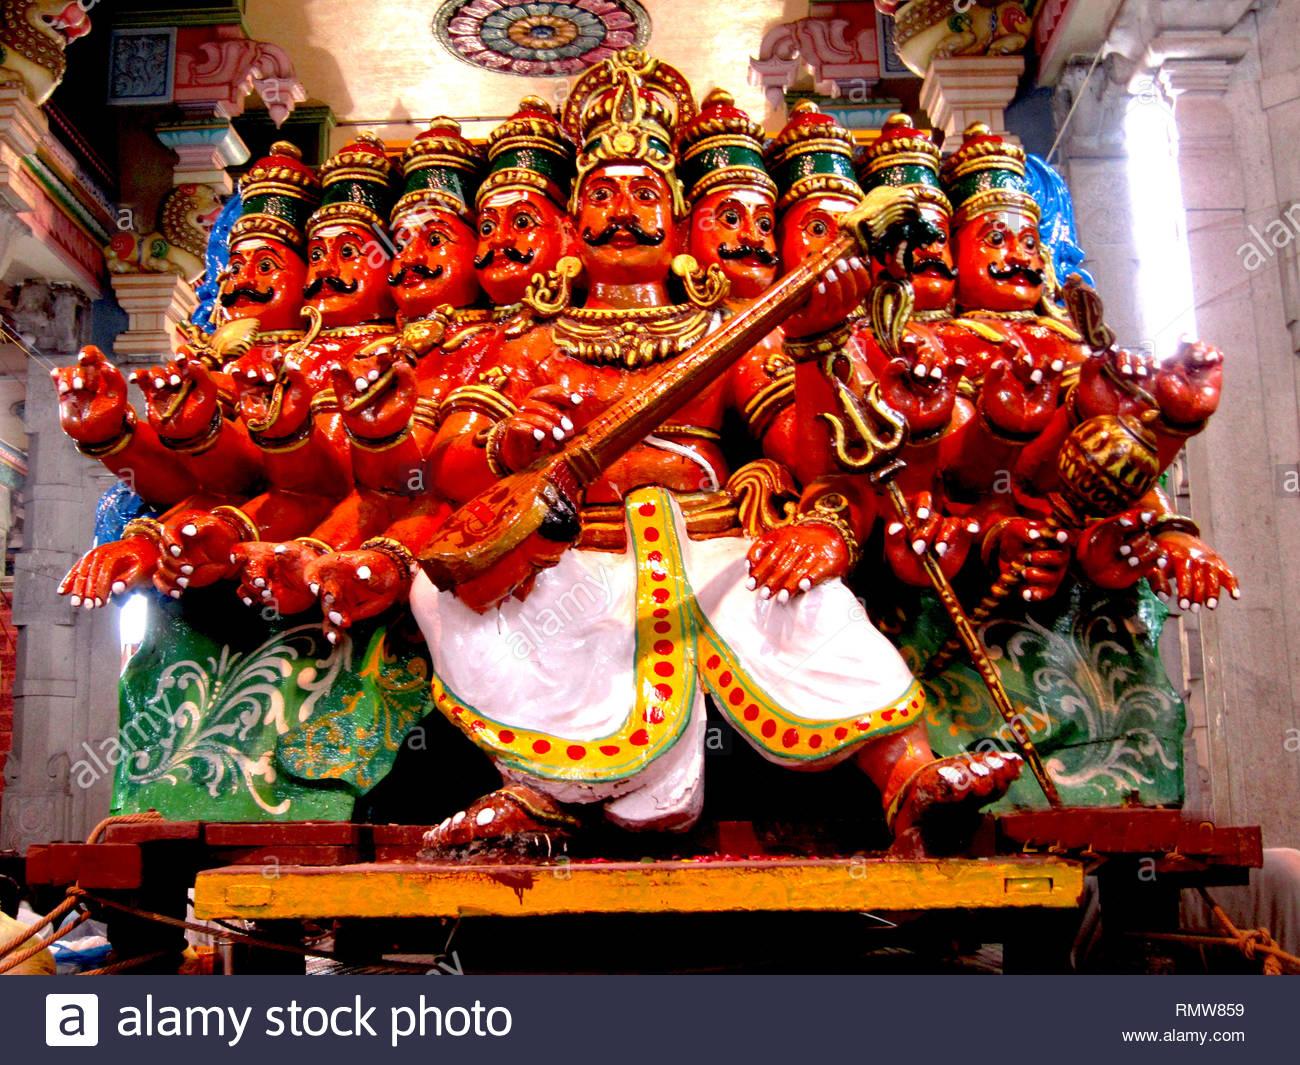 Ravanan Vimanam deity, Tiruvannamalai, Tamil Nadu, India, Asia - Stock Image